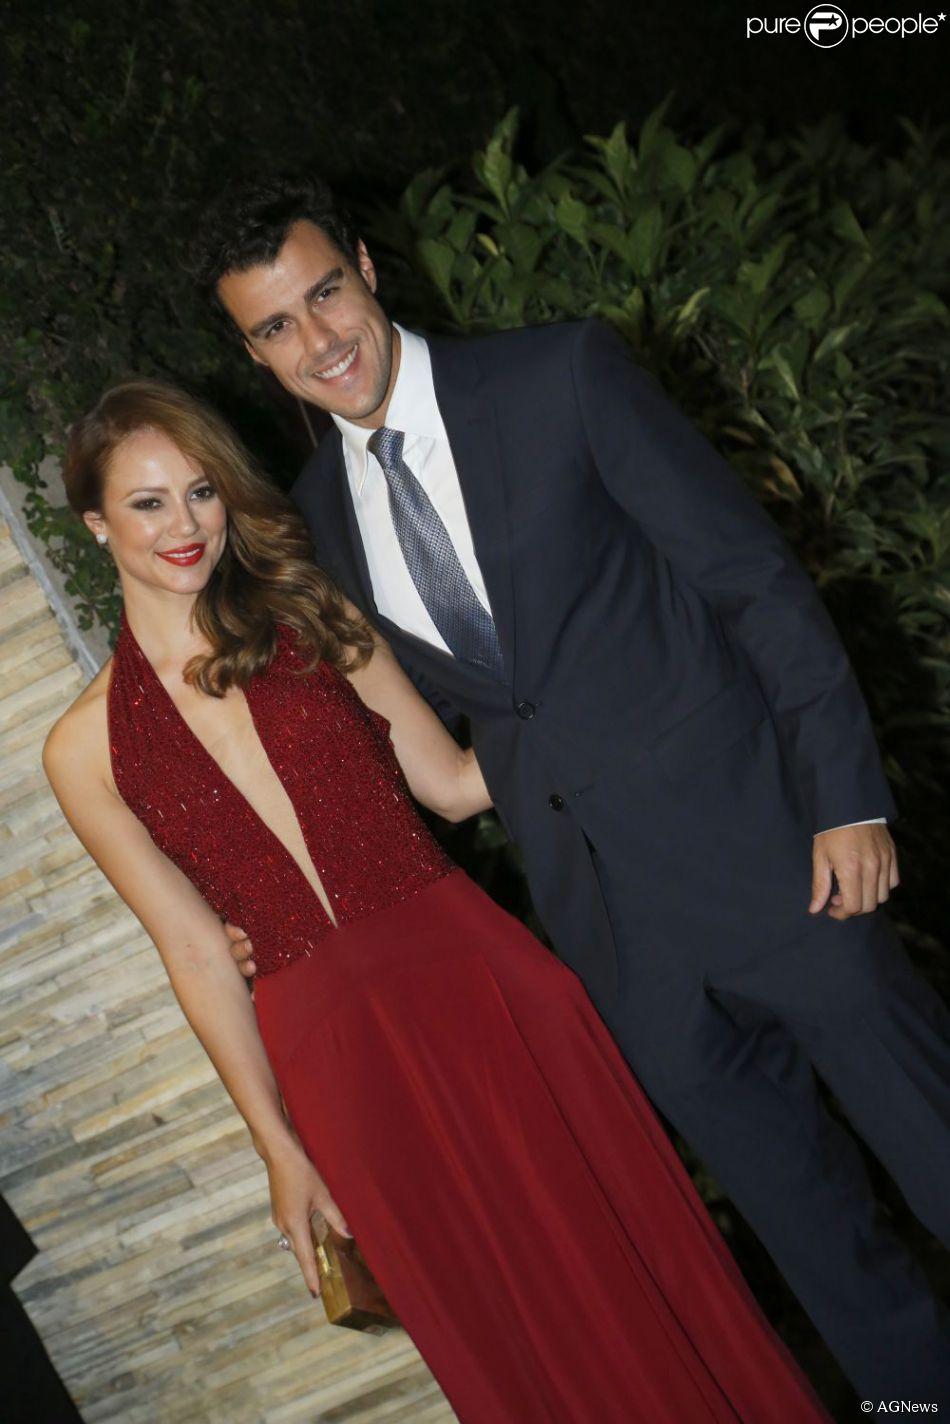 Paolla Oliveira posa com o marido, Joaquim Lopes - Purepeople